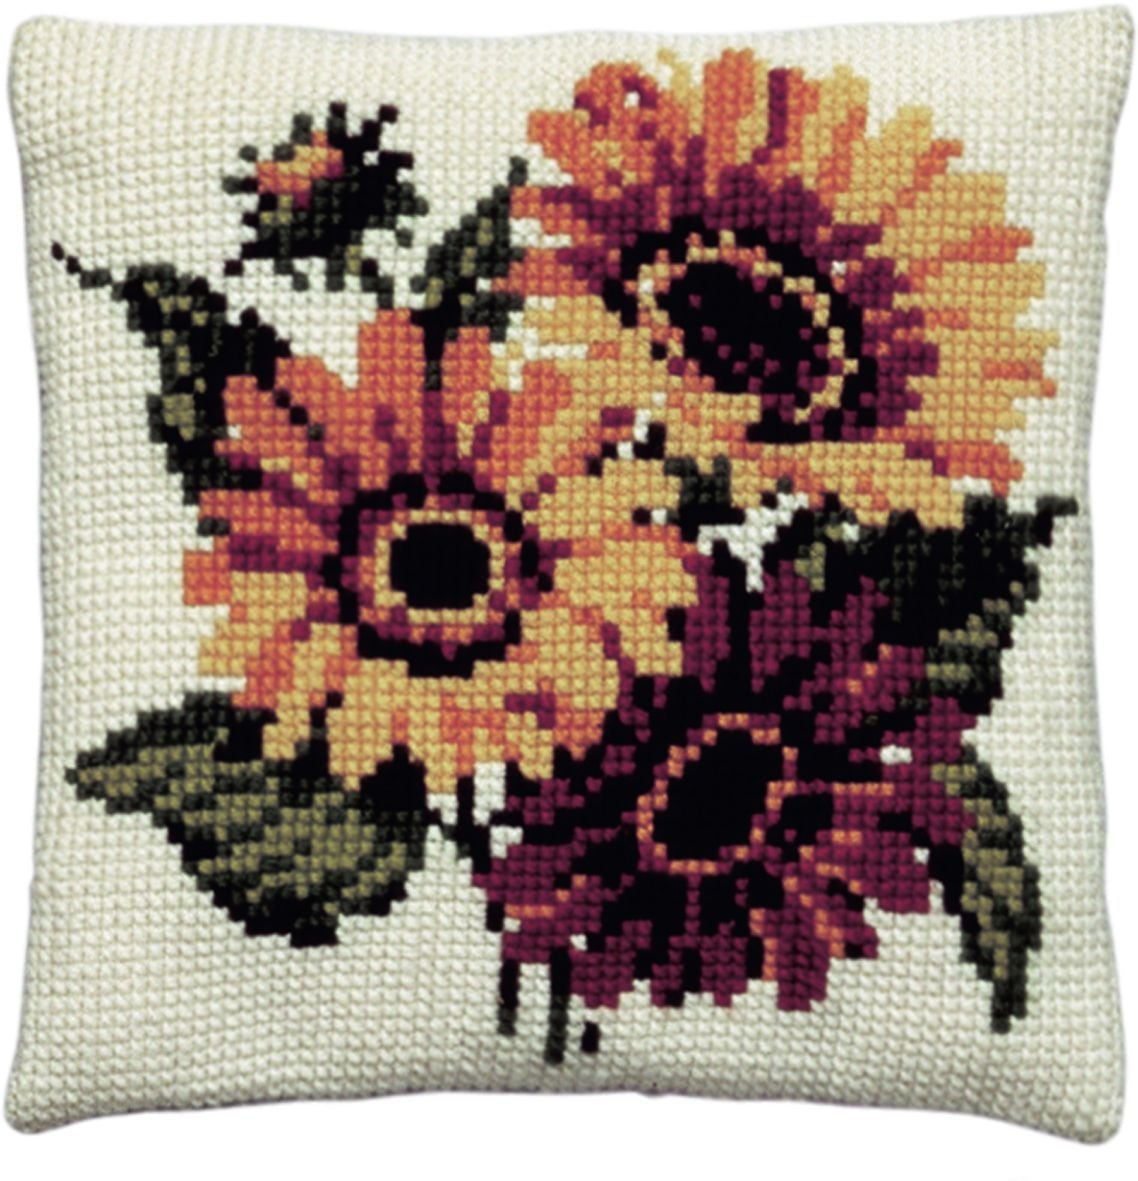 cross stitch cushion sunflowers printed